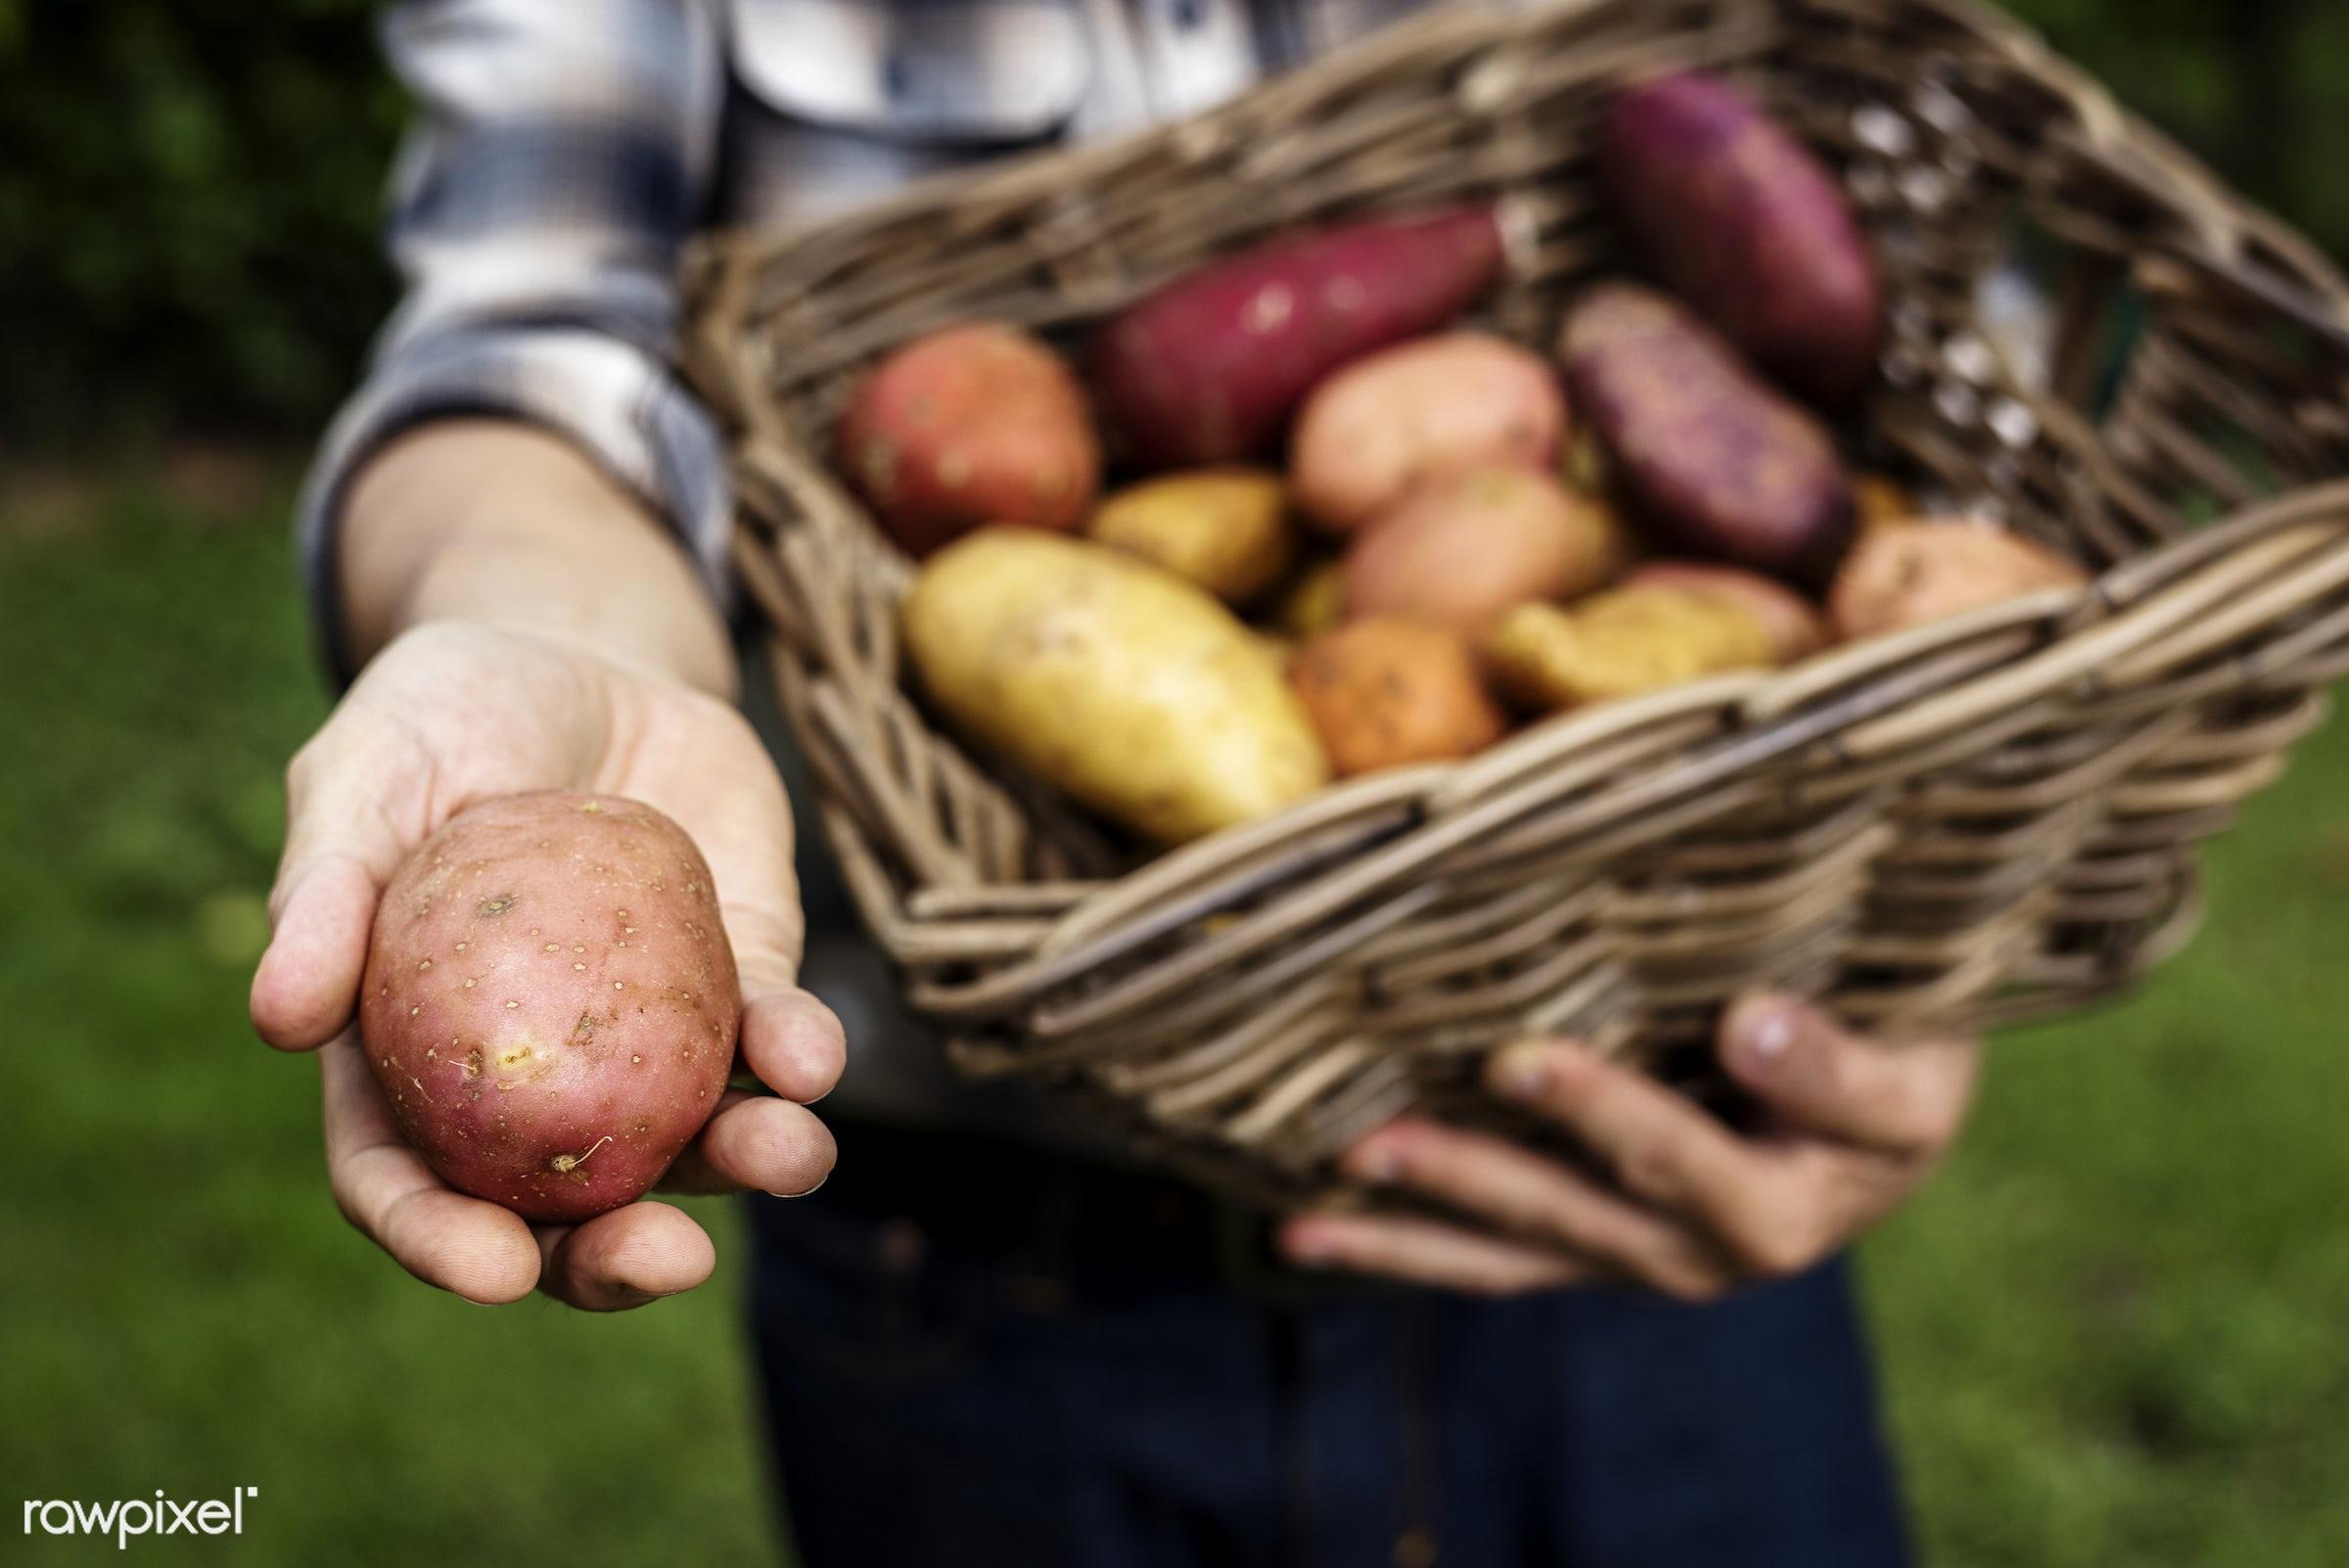 raw, holding, potatoes, farm, nature, hands, fresh, closeup, organic, basket, healthy, harvest, vegetable, produce